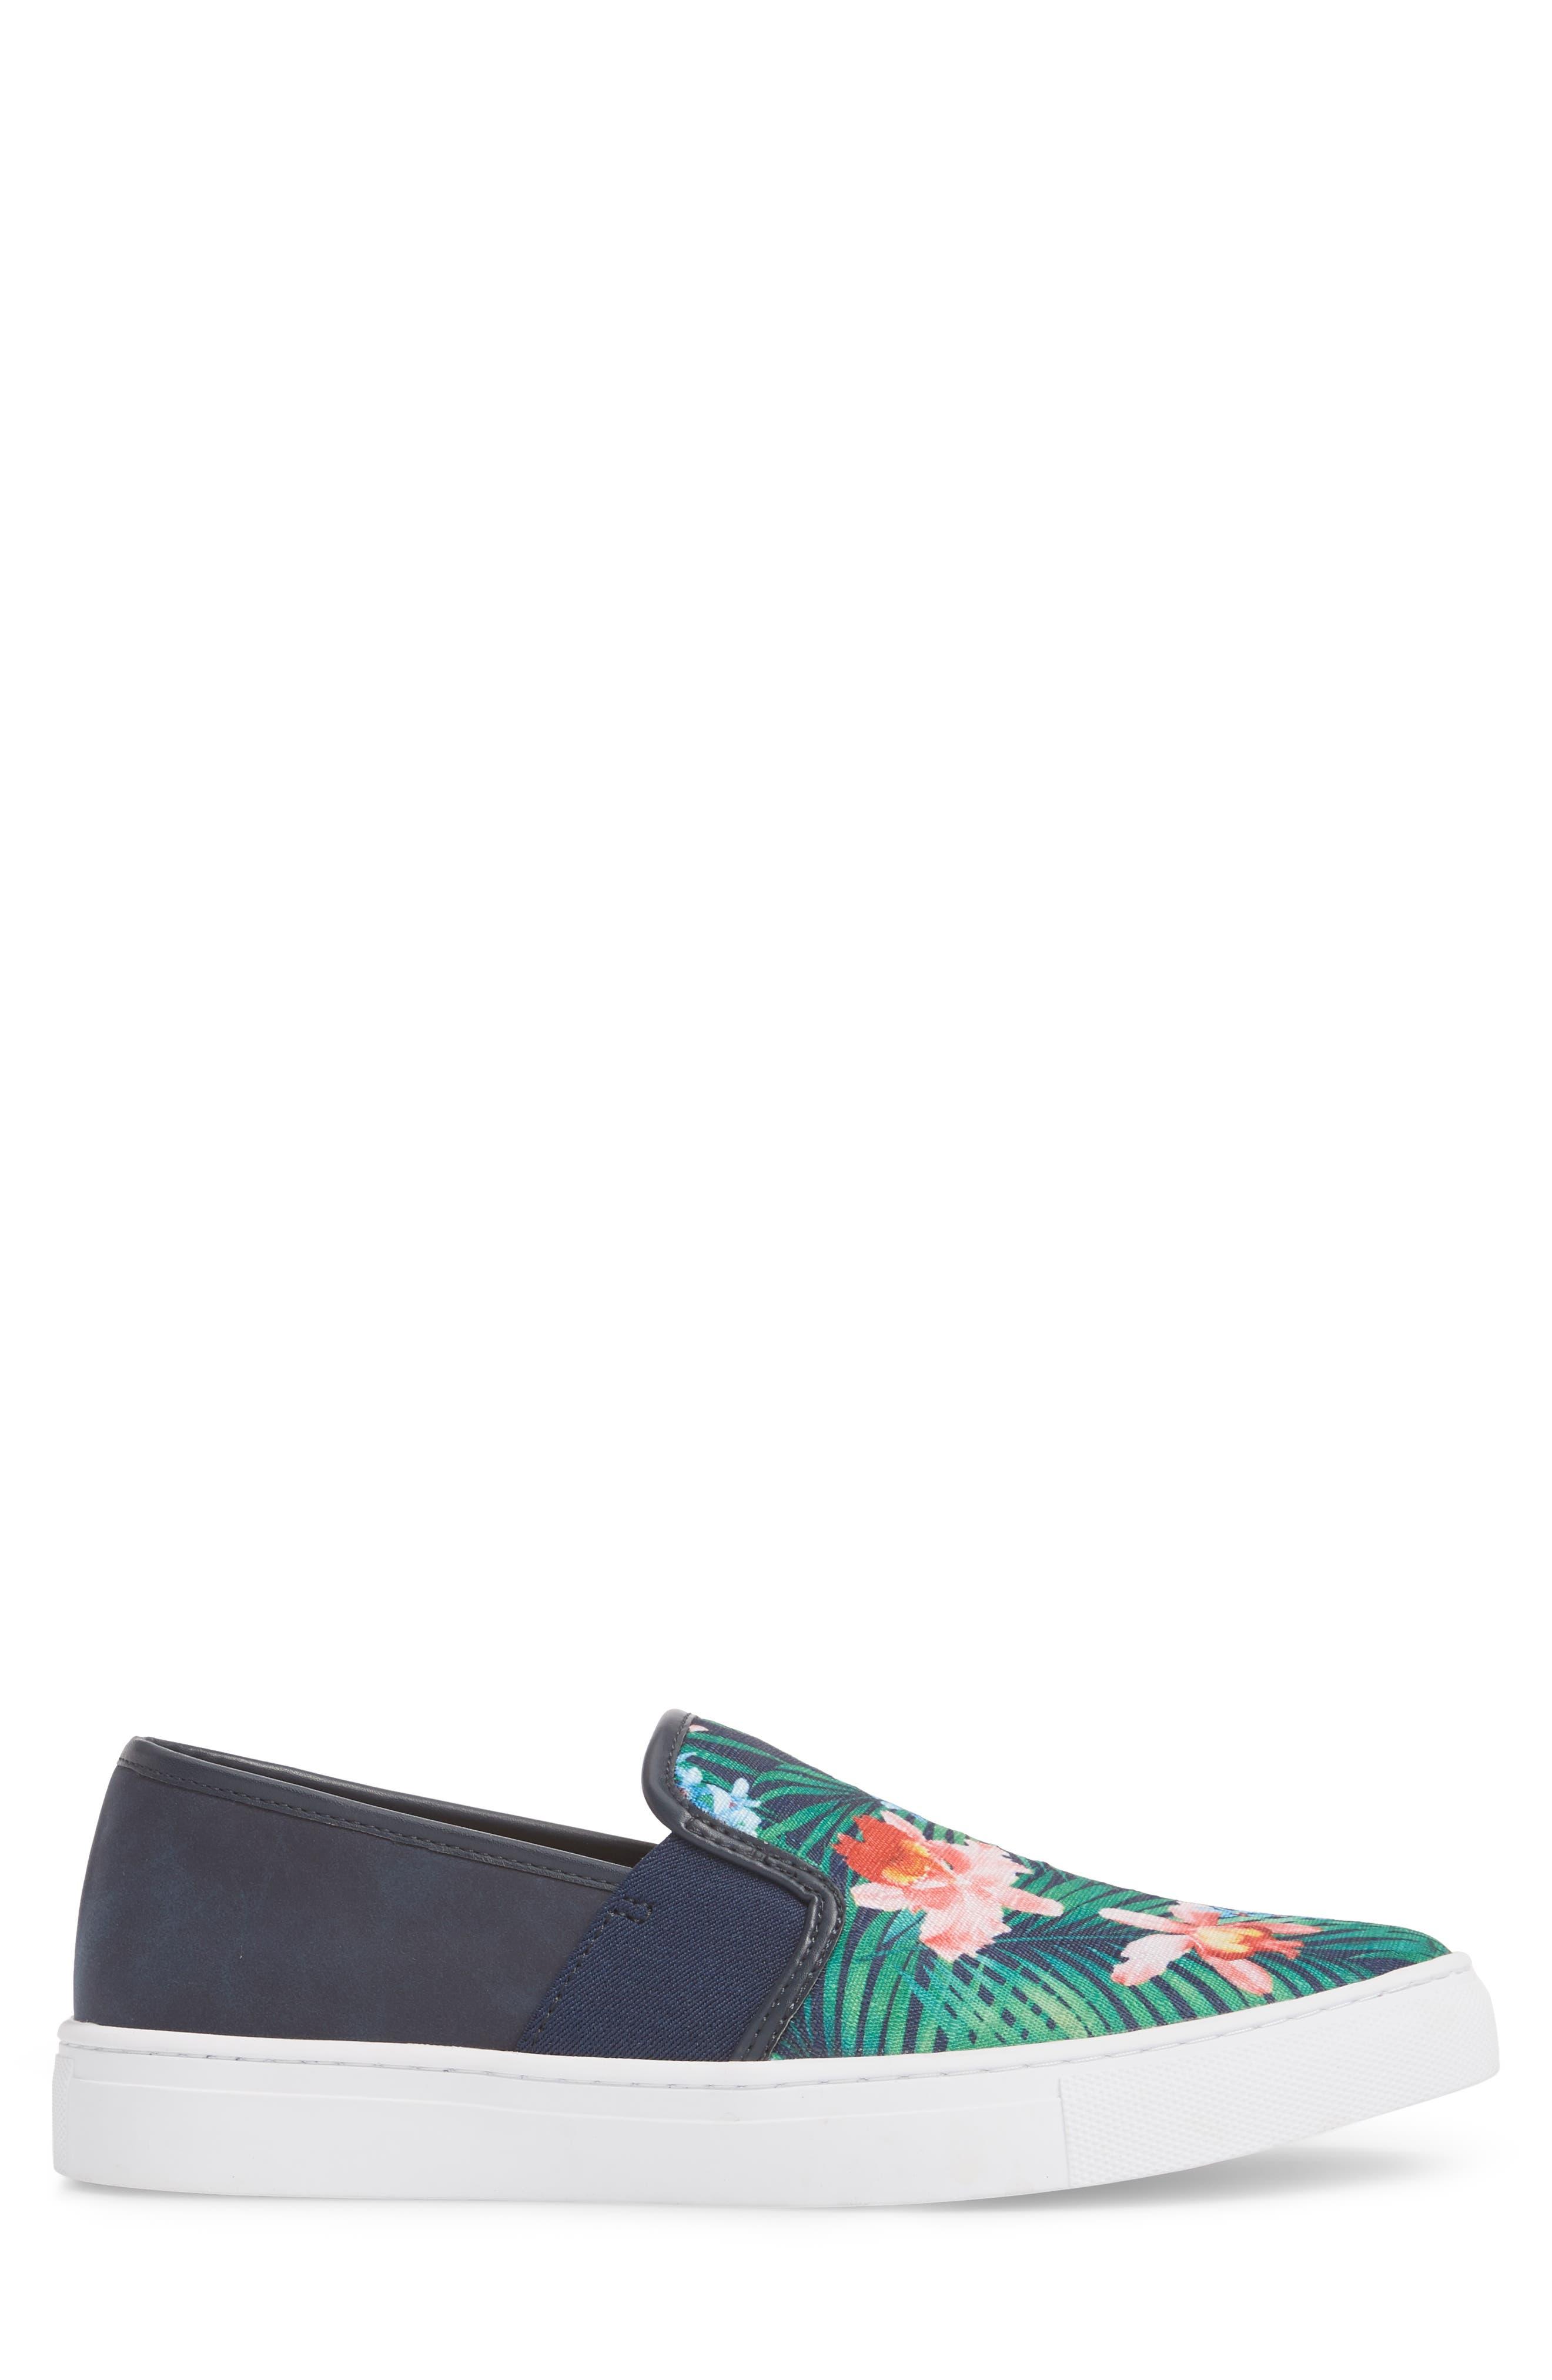 Fish 'N' Chips Bali Slip-On Sneaker,                             Alternate thumbnail 3, color,                             Navy Multi Fabric